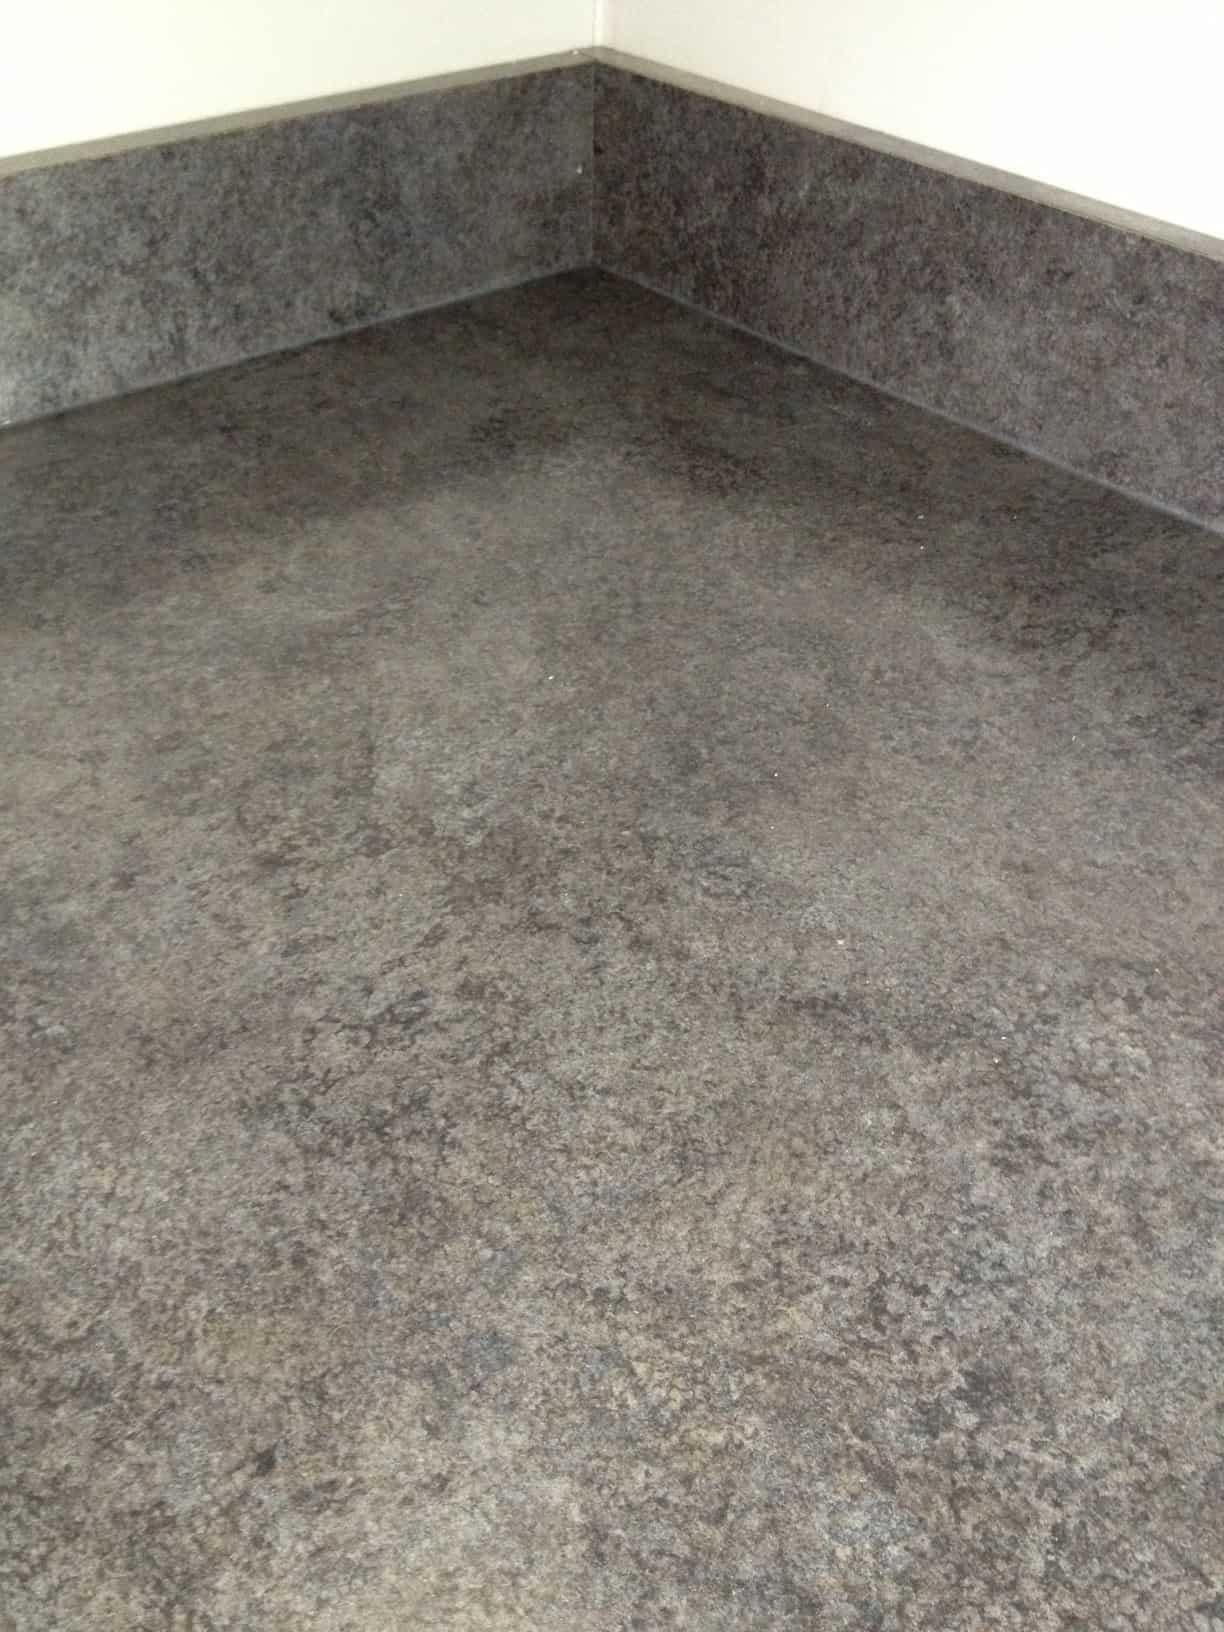 A close up of grey, veneer countertops